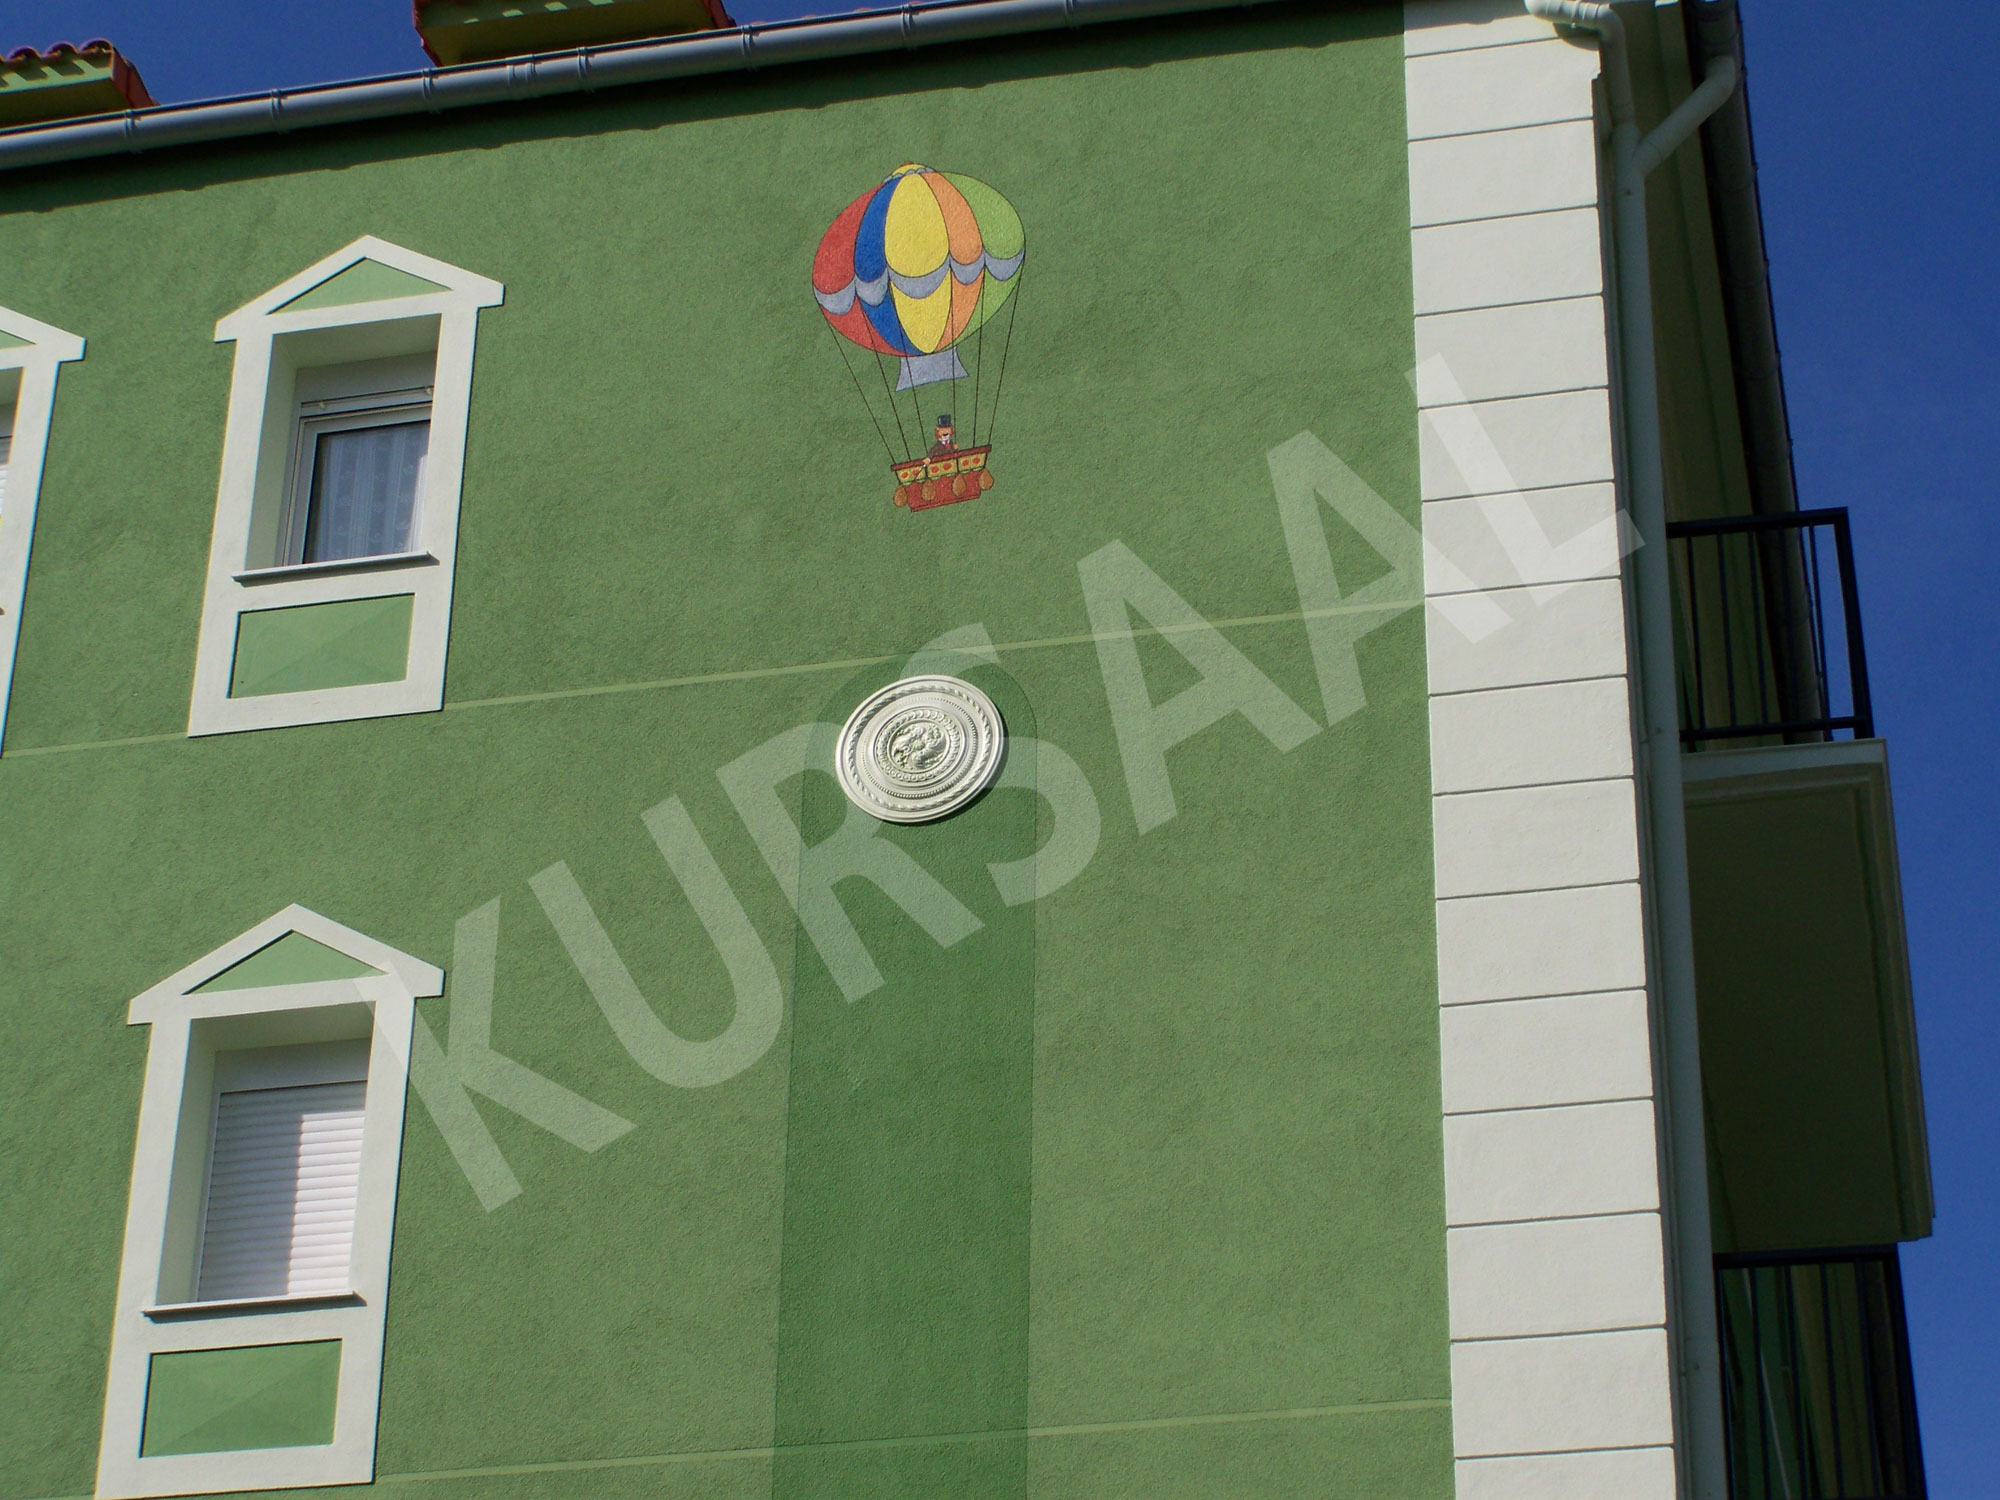 foto 3 - Aislamientos Térmicos y Eficiencia Energética-José Elosegui 124-DONOSTIA, GIPUZKOA